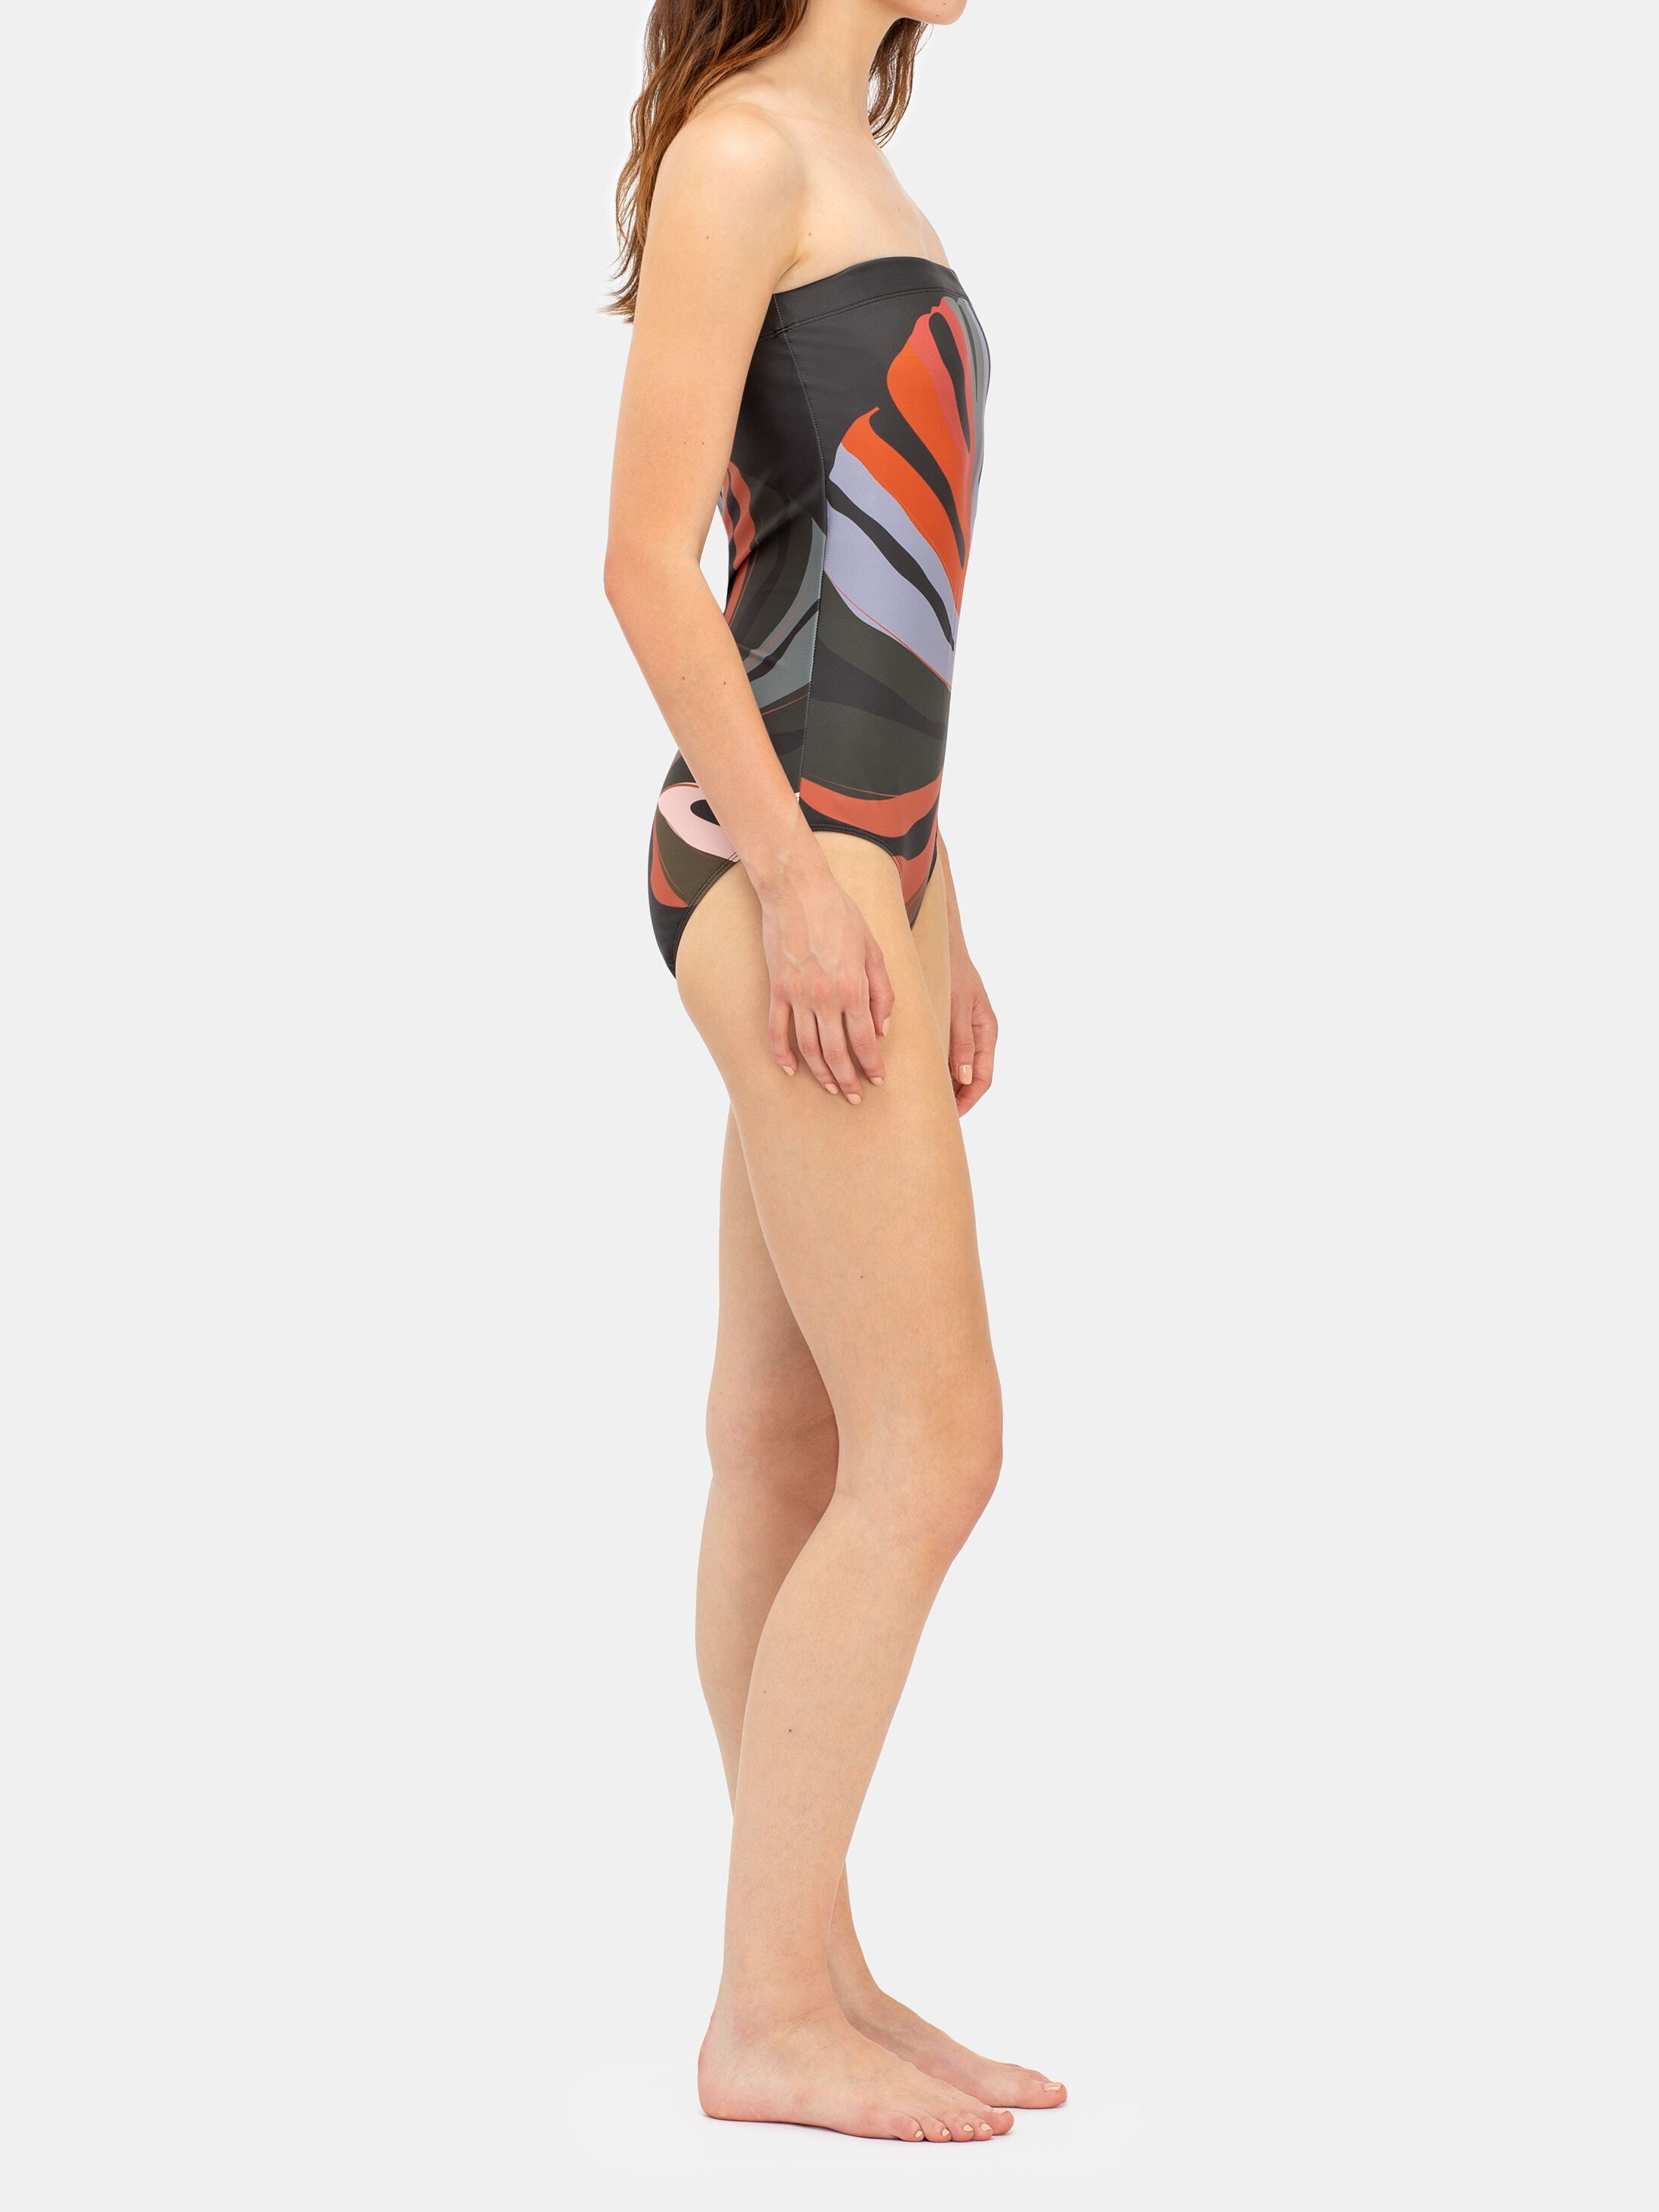 Customised Strapless swimsuit